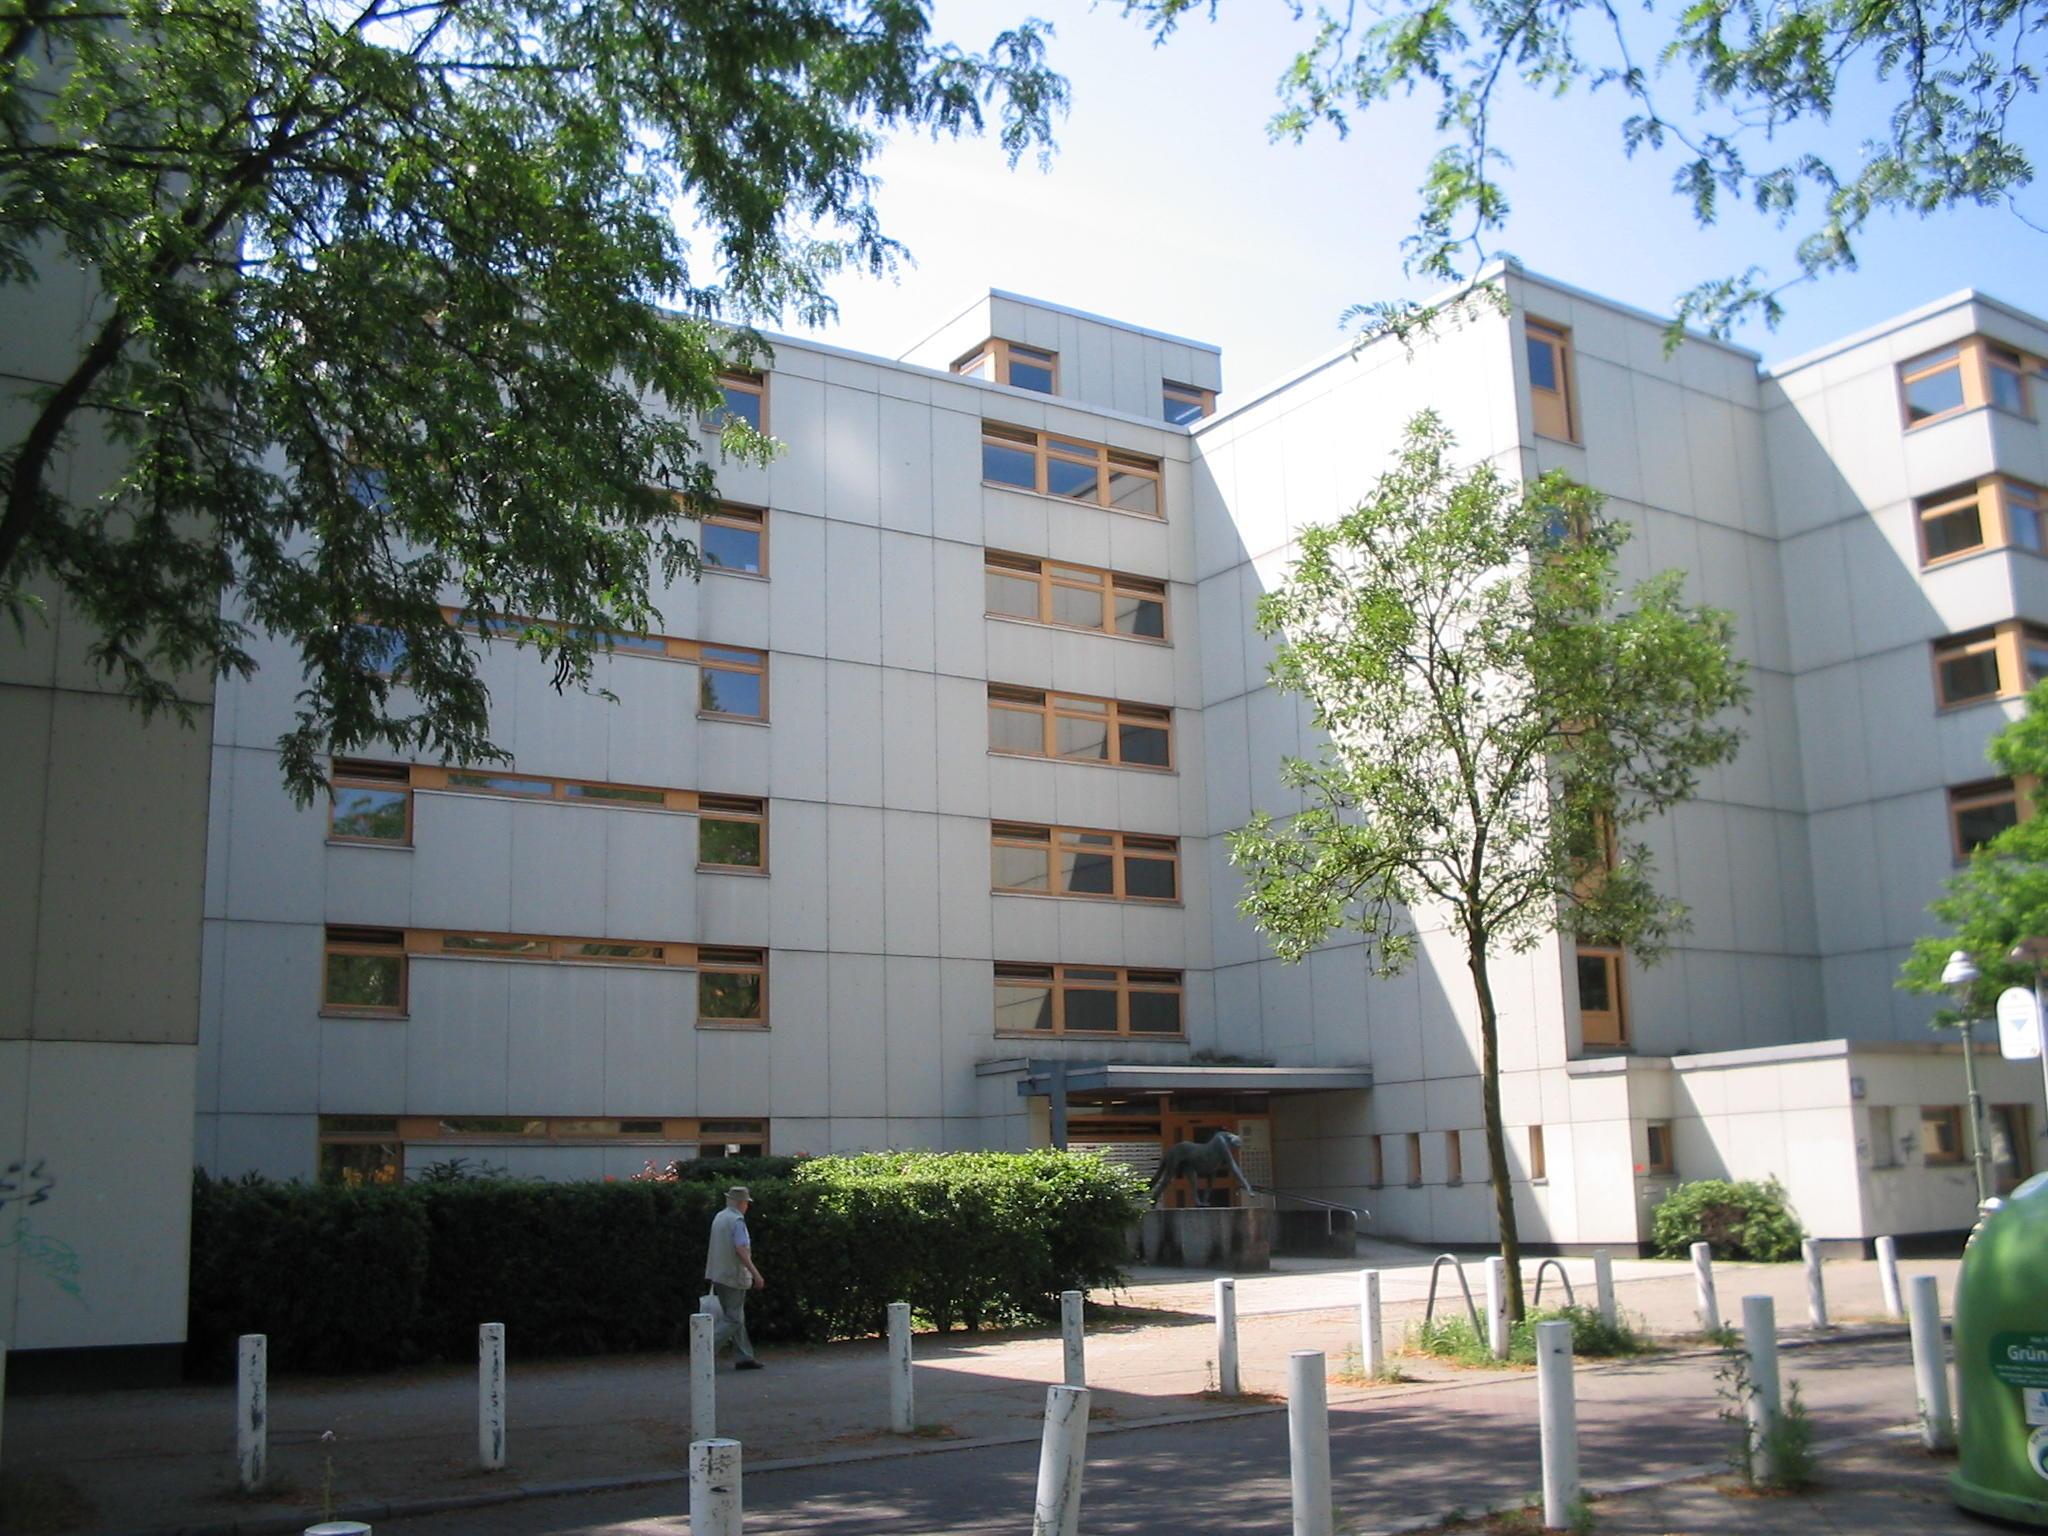 Seniorenwohnhaus Pestalozzistraße